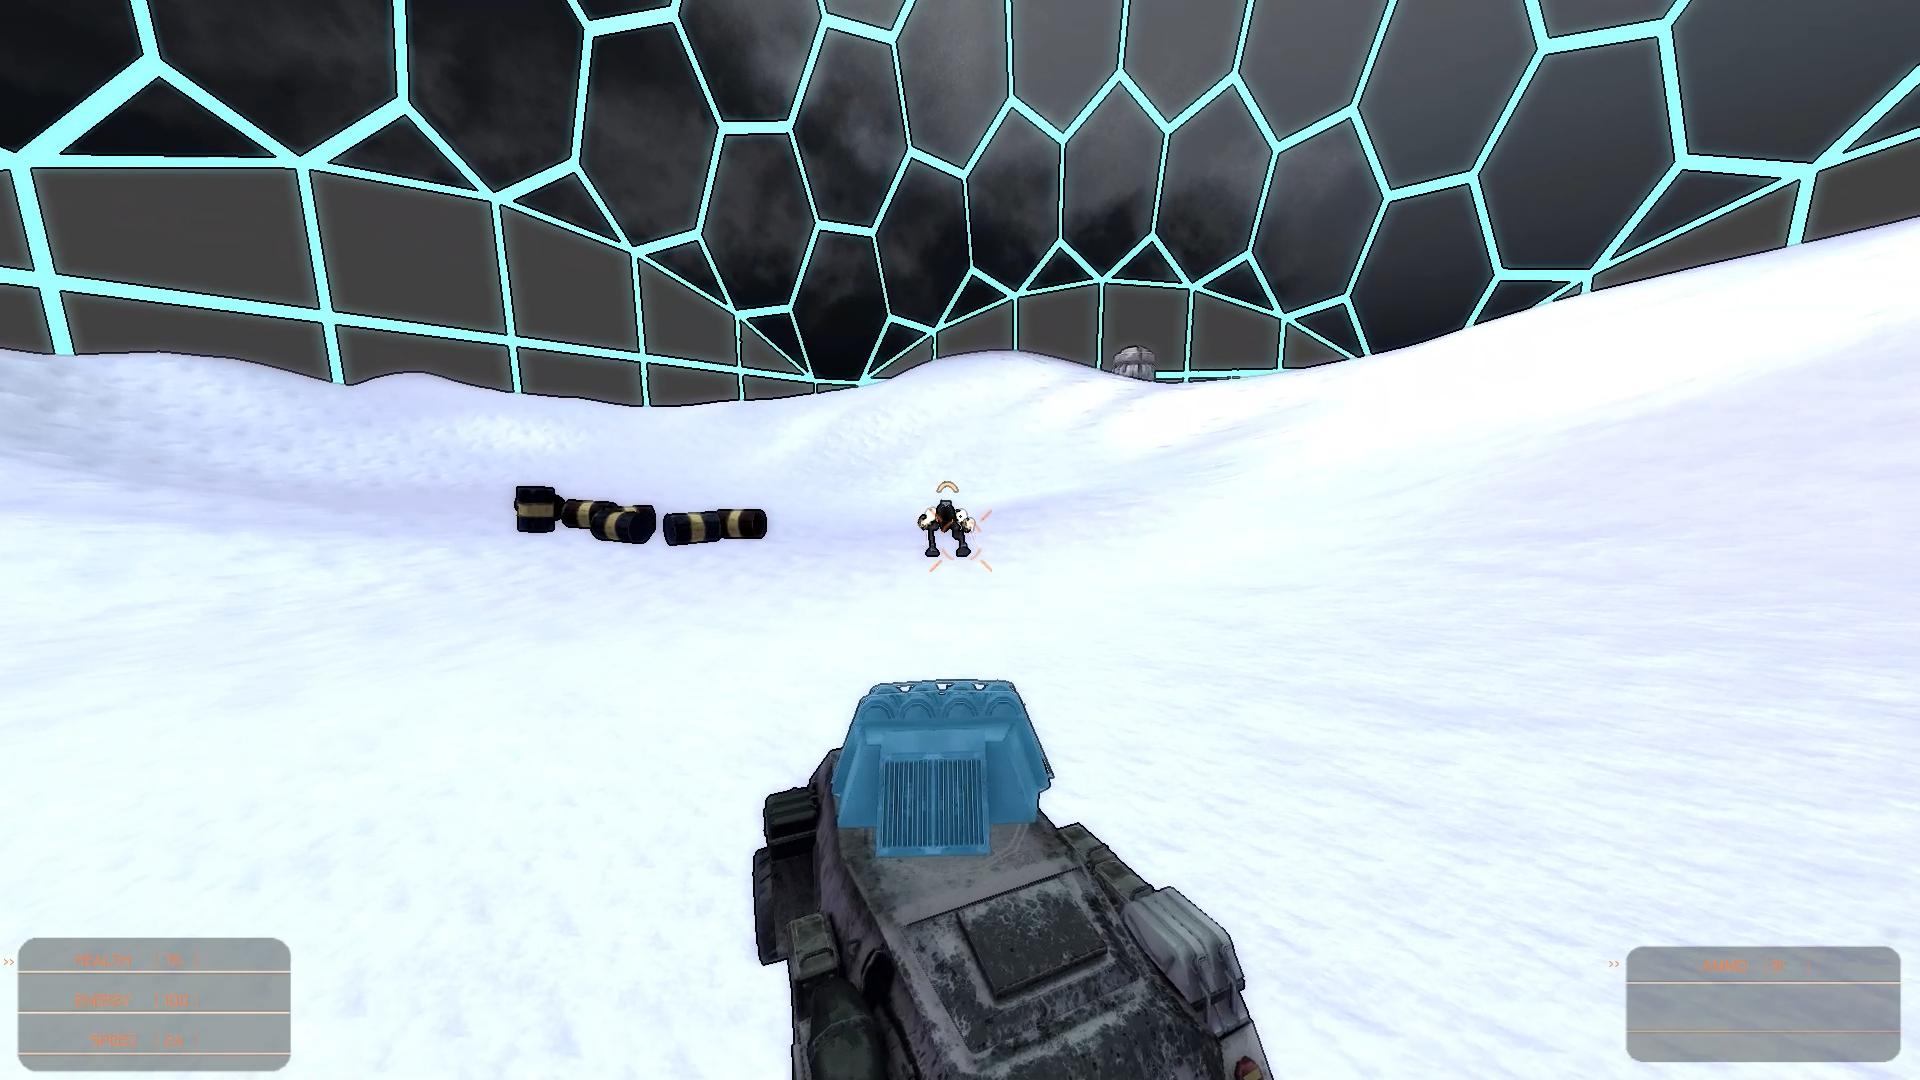 Capturas de pantalla del videojuego Surrogate